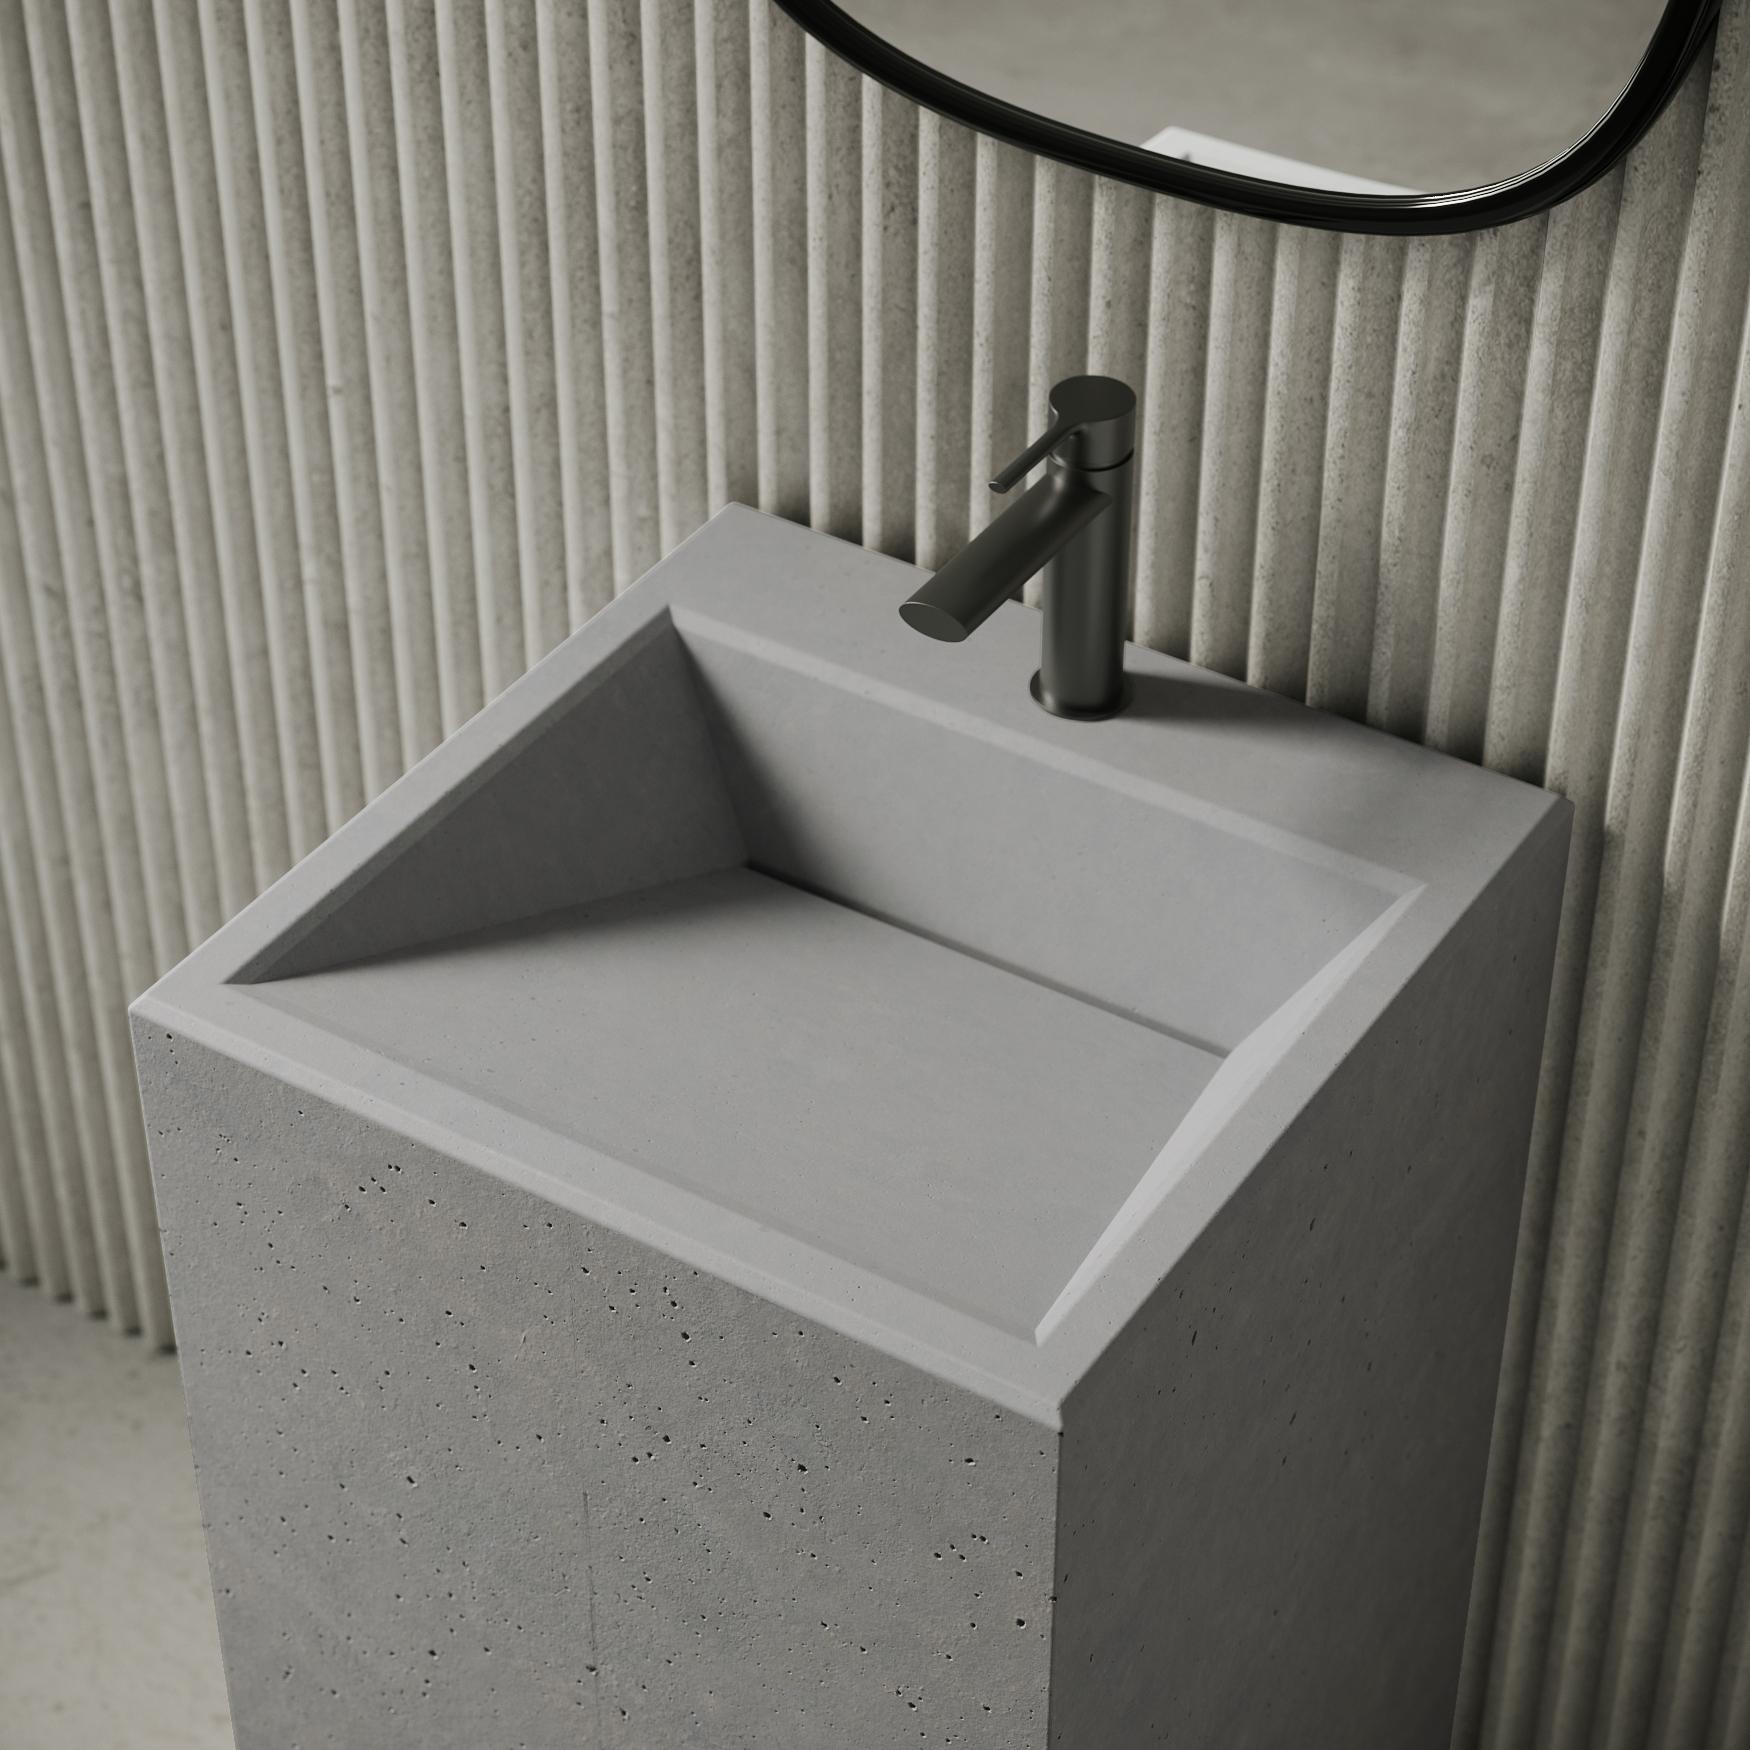 Умывальник из бетона керамзитобетон d800 характеристики